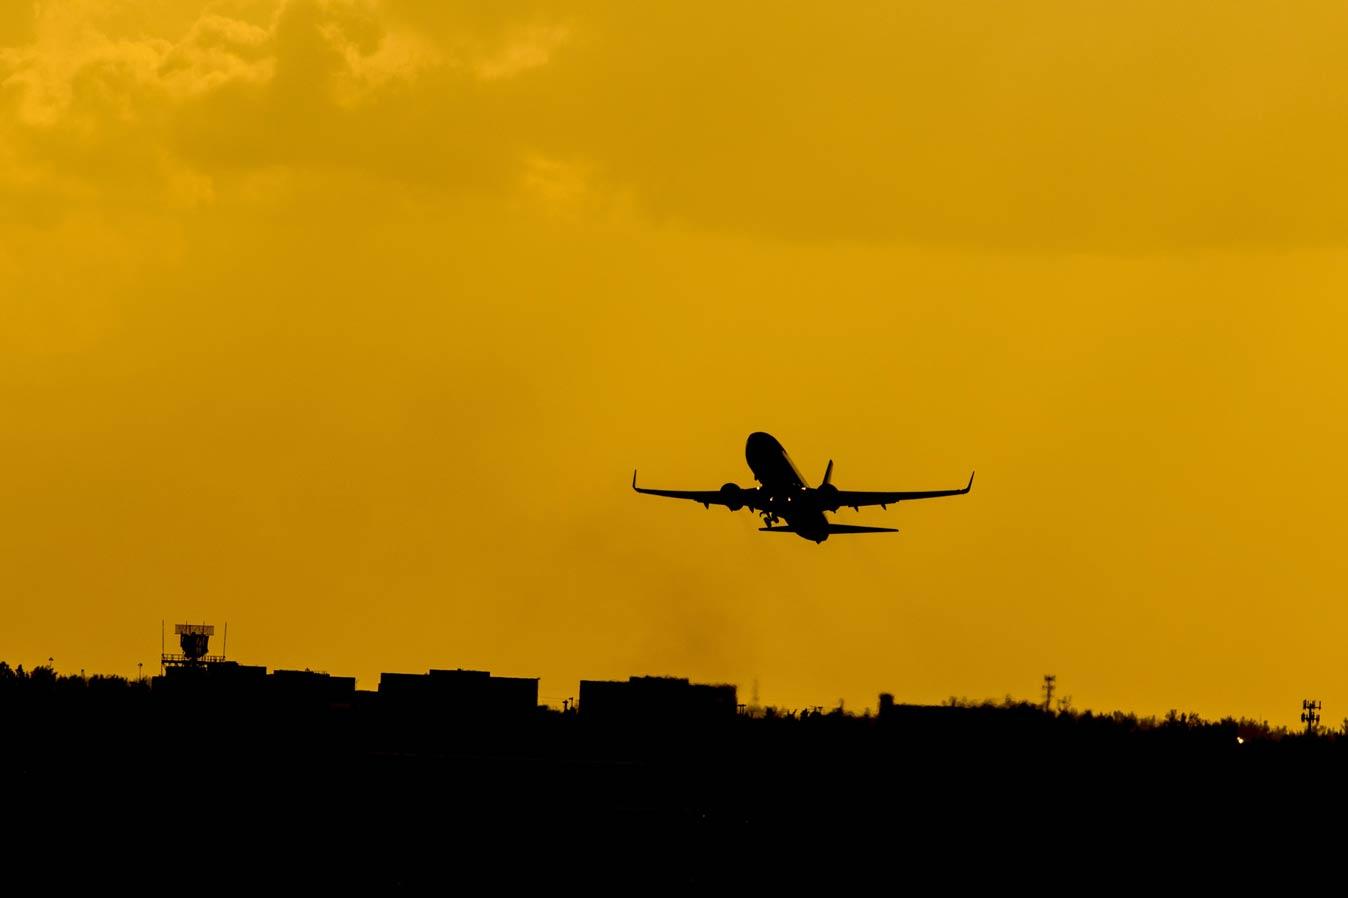 В аэропорту Нанта (Франция) введут комендантский час